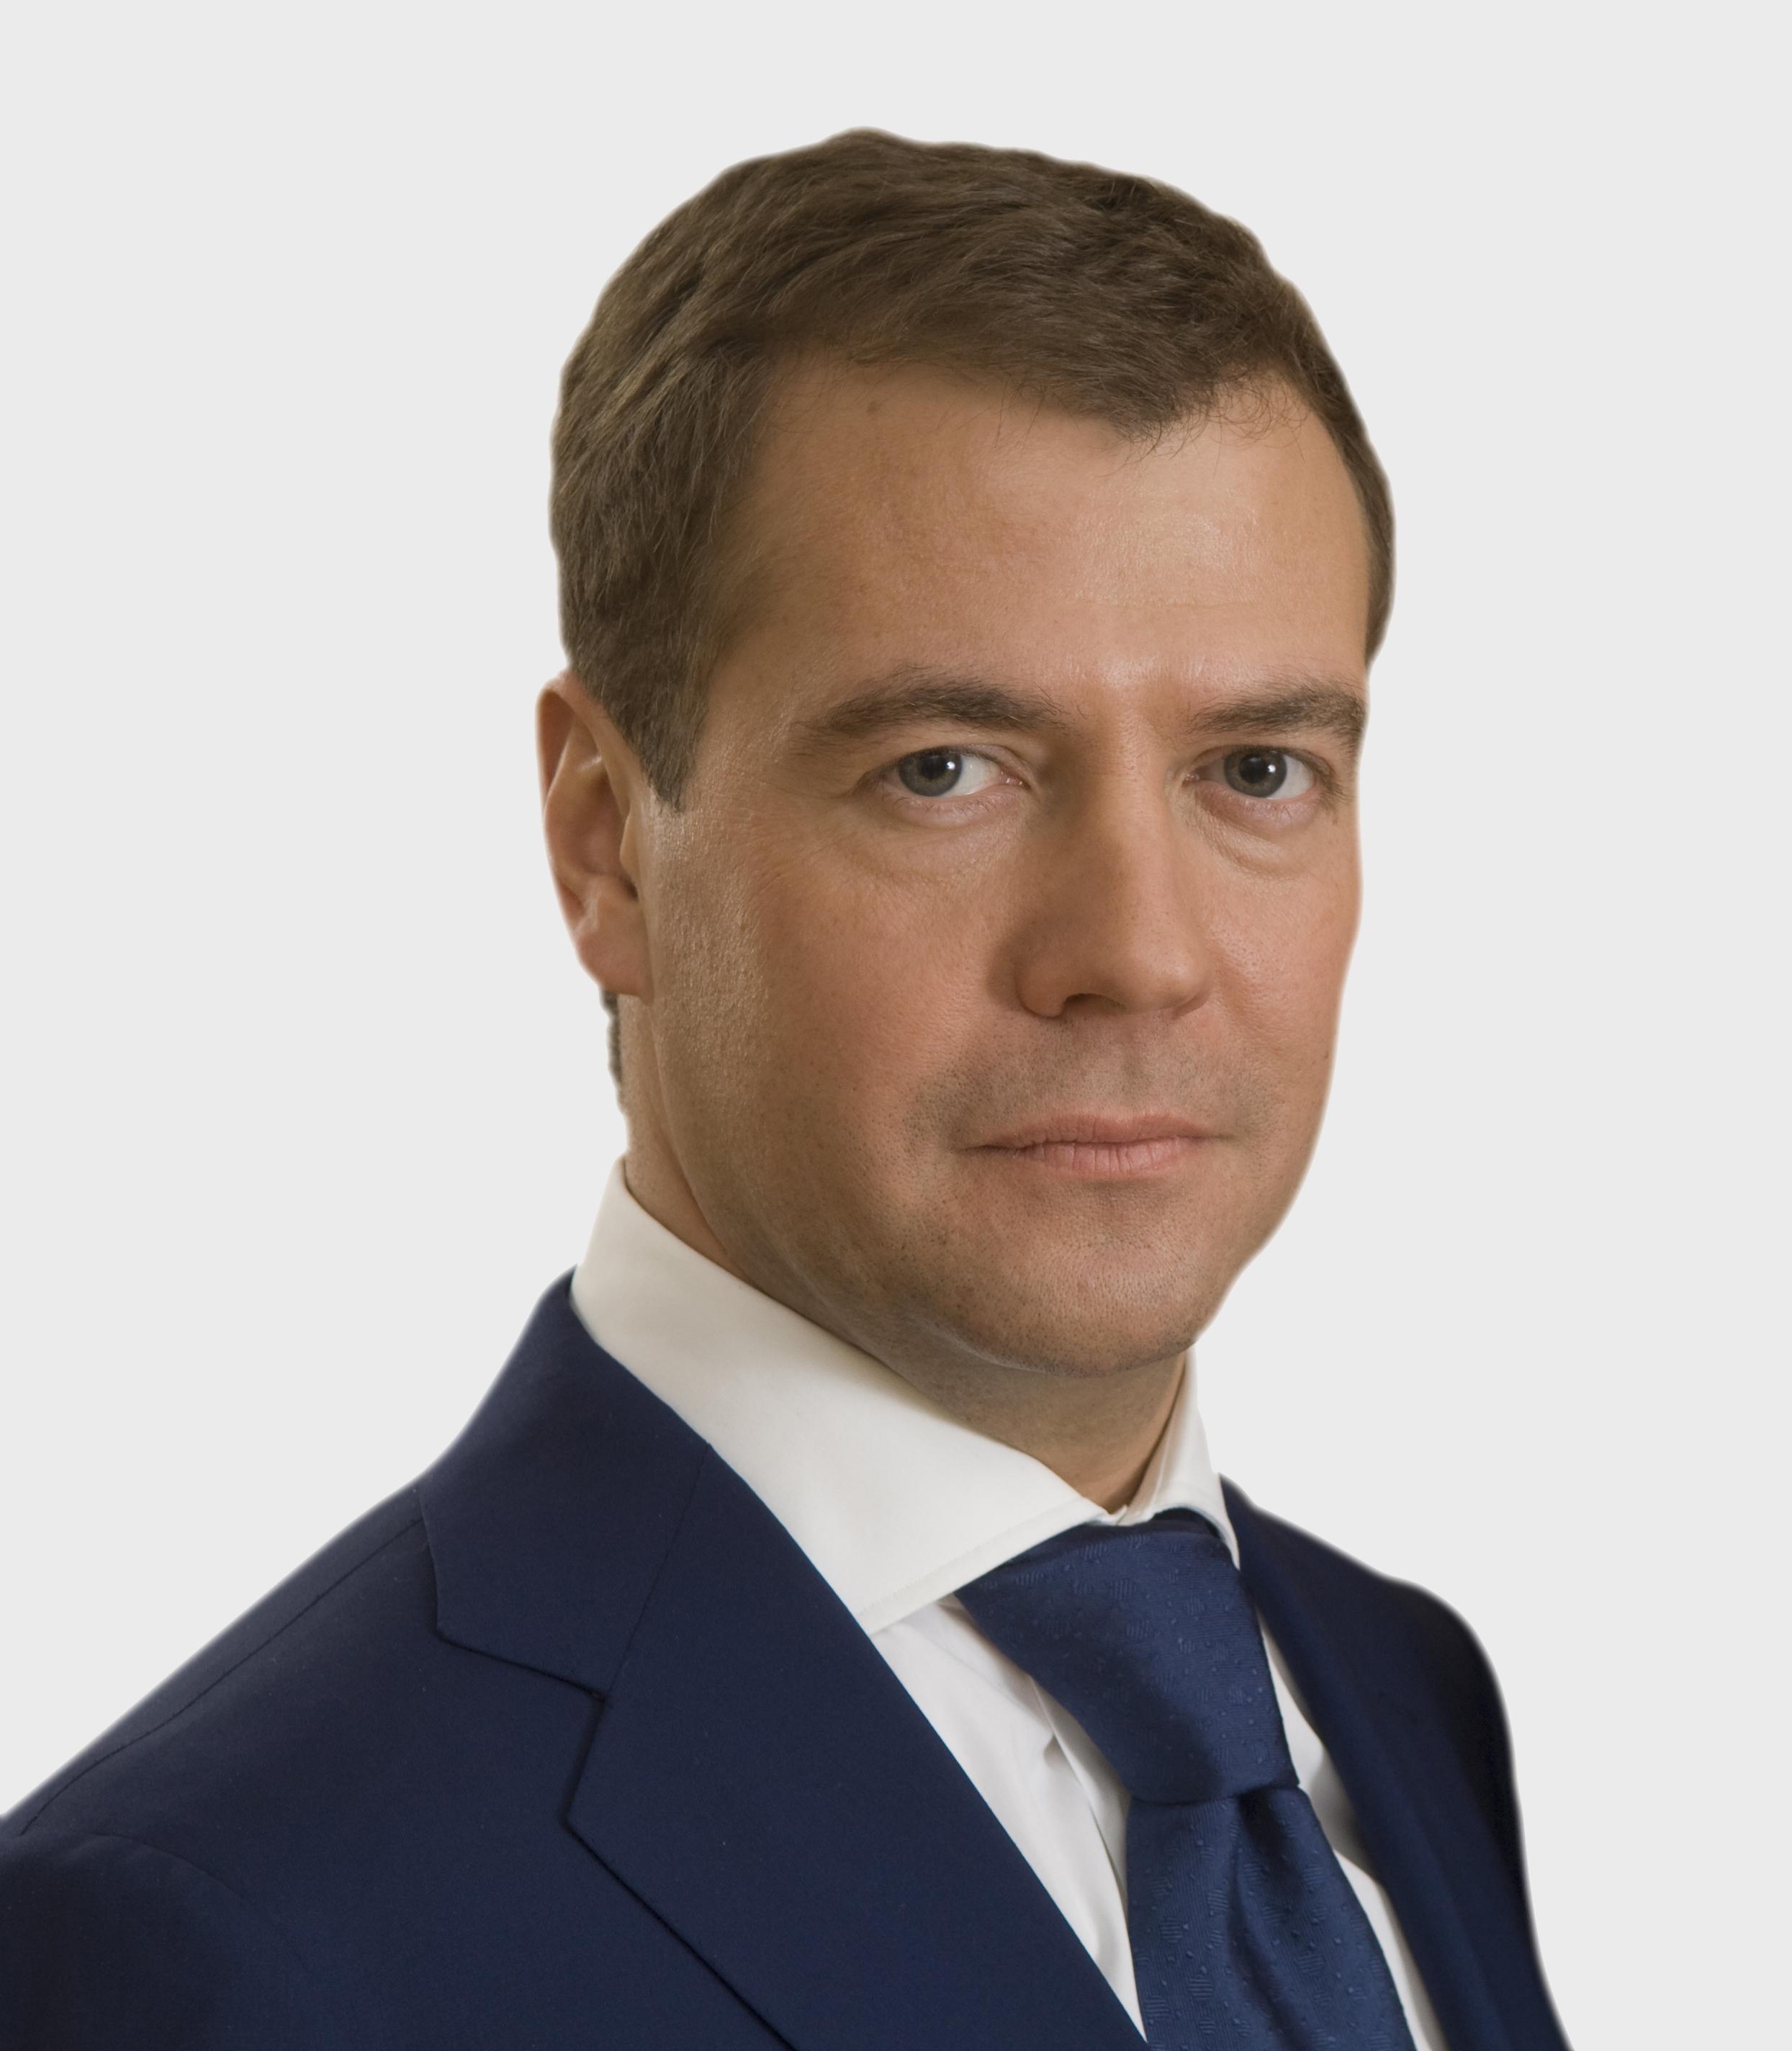 Dmitry Medvedev (Joan of What?)